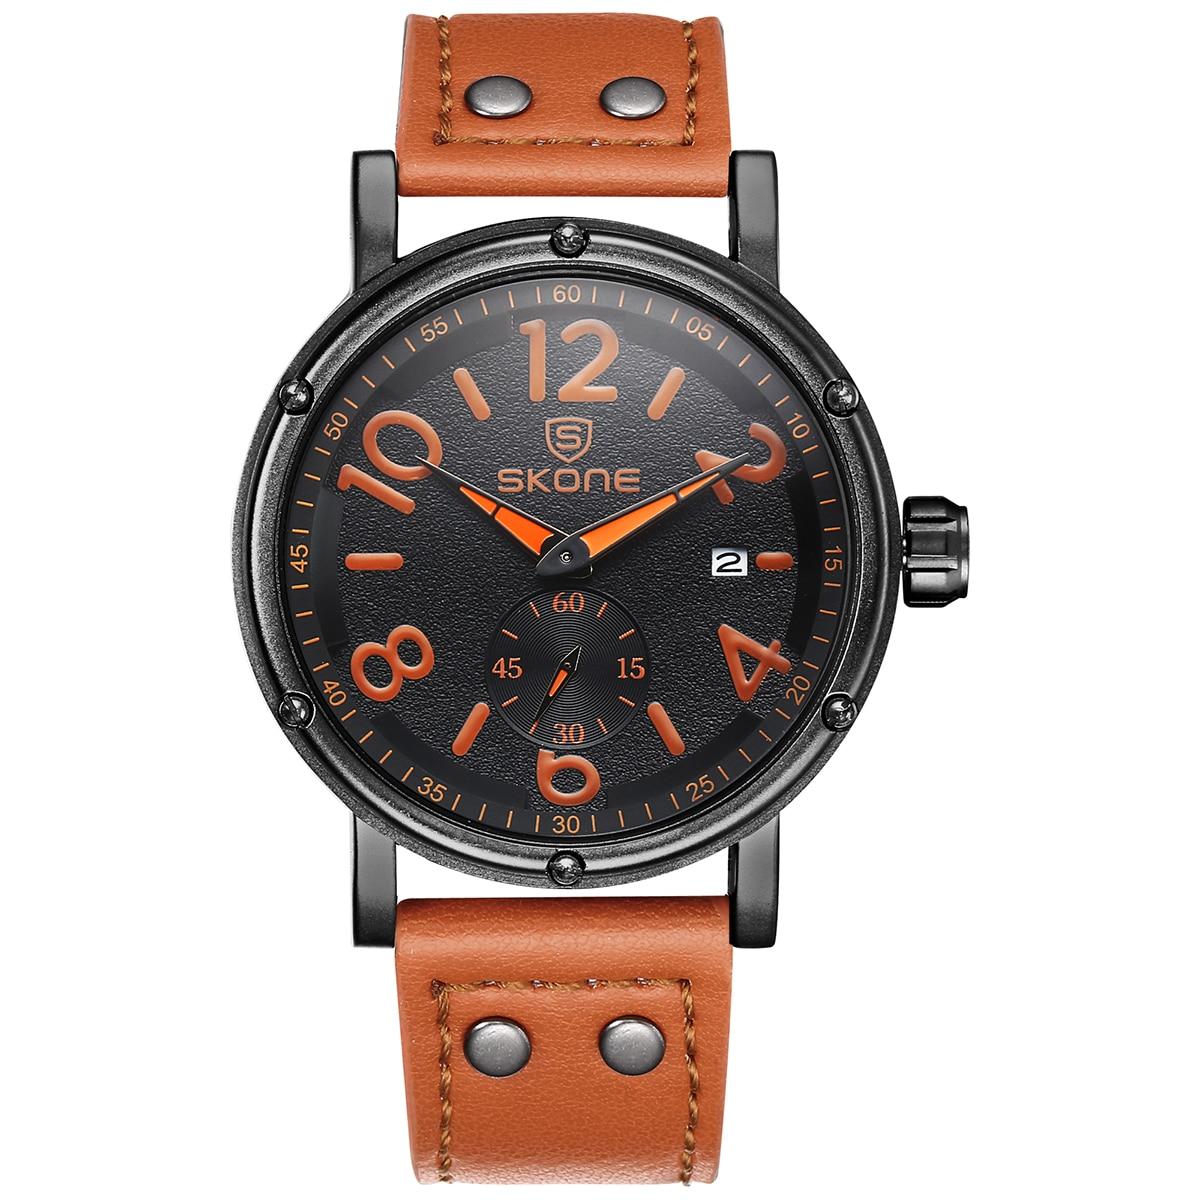 цена SKONE  Independent Small Seconds Dial Calendar Display Quartz Movement Buckle Fashion Men Watch онлайн в 2017 году